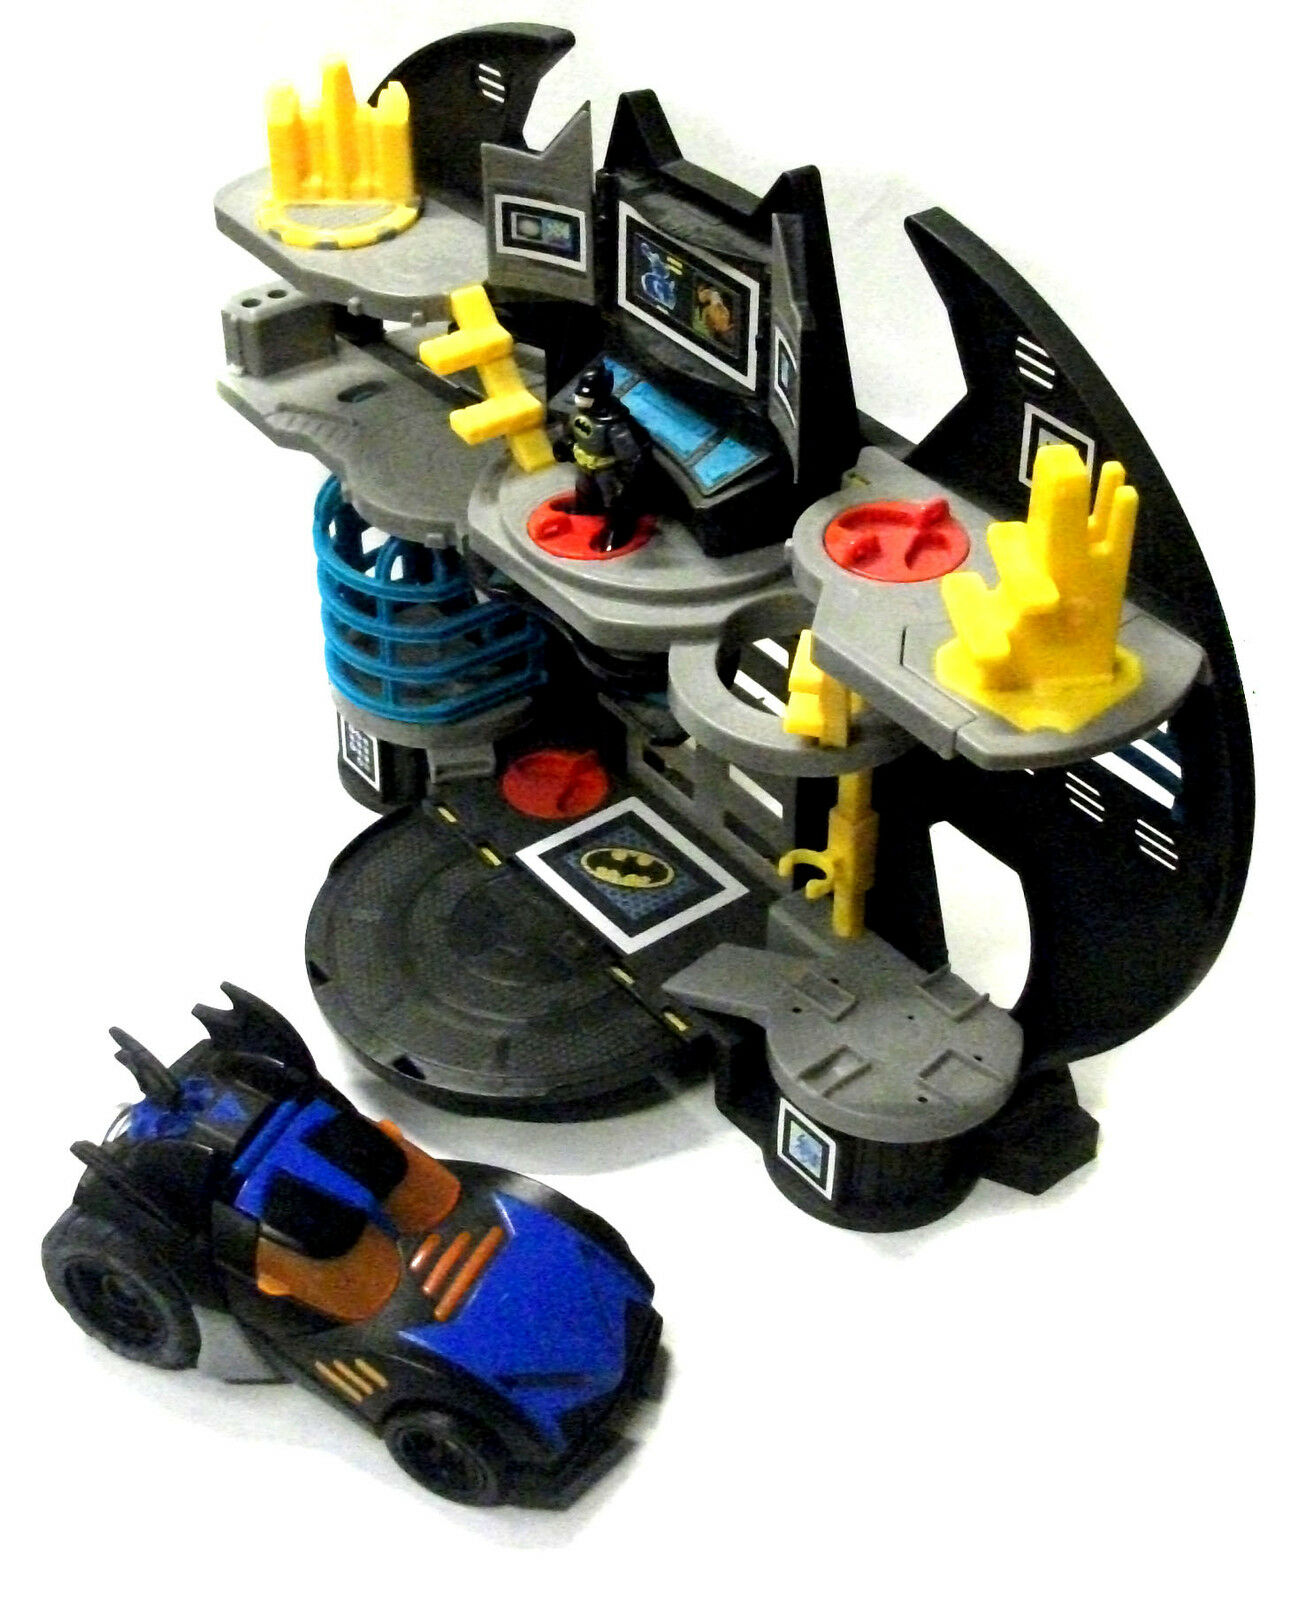 Fisher Price BATMAN IMAGINEXT Bat Cave, Deluxe Batmobile Car & Figure set lot